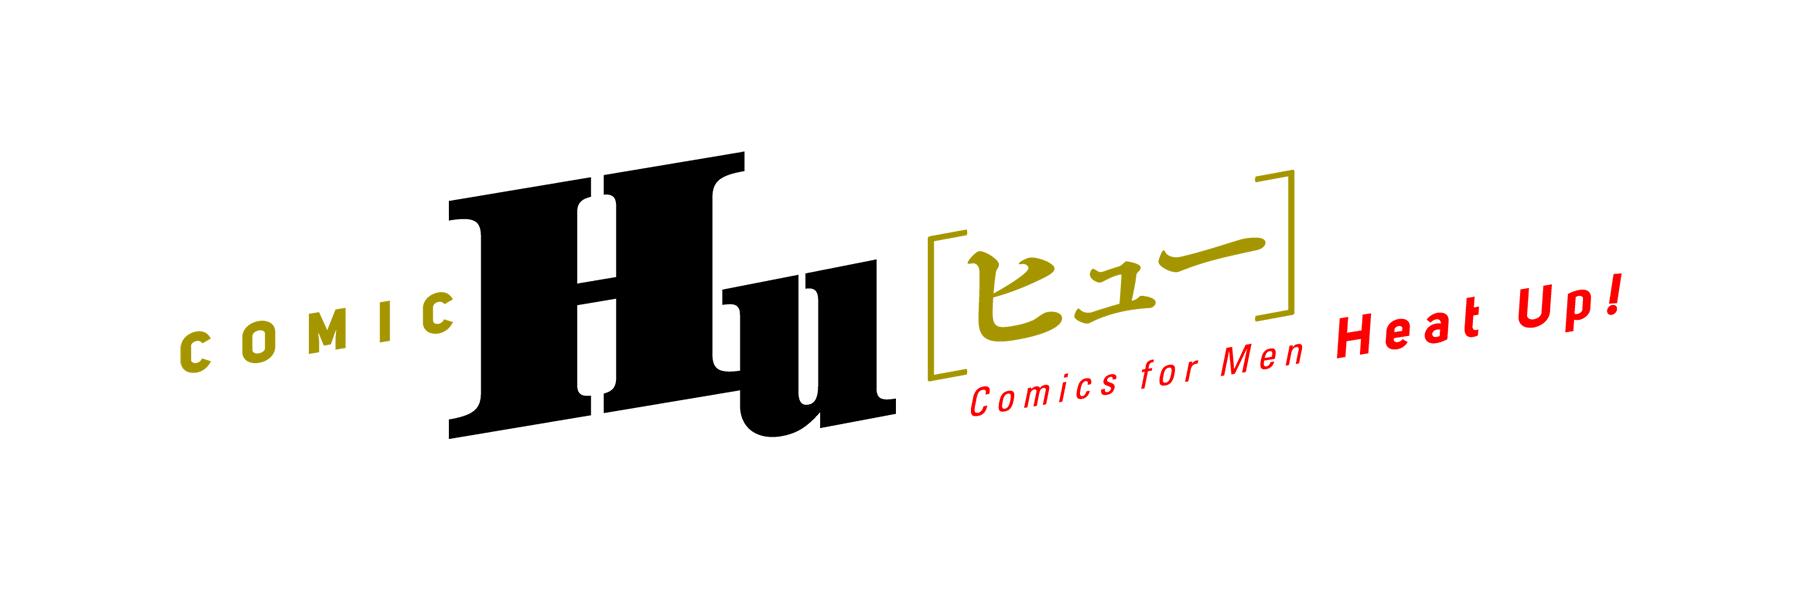 COMIC Hu